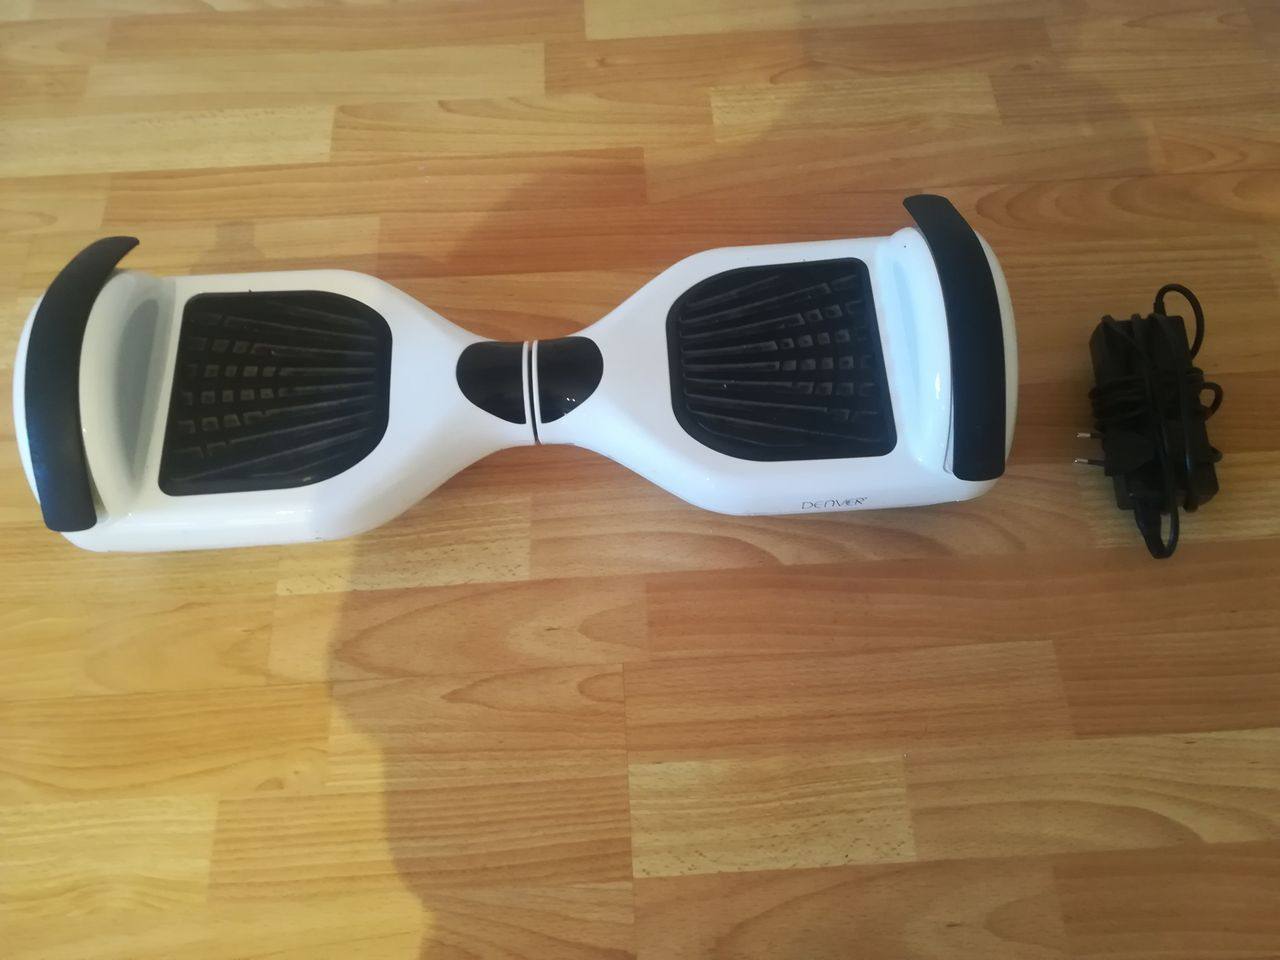 Hoverboard Denver DBO 6501 White MK2 + Lader | FINN.no